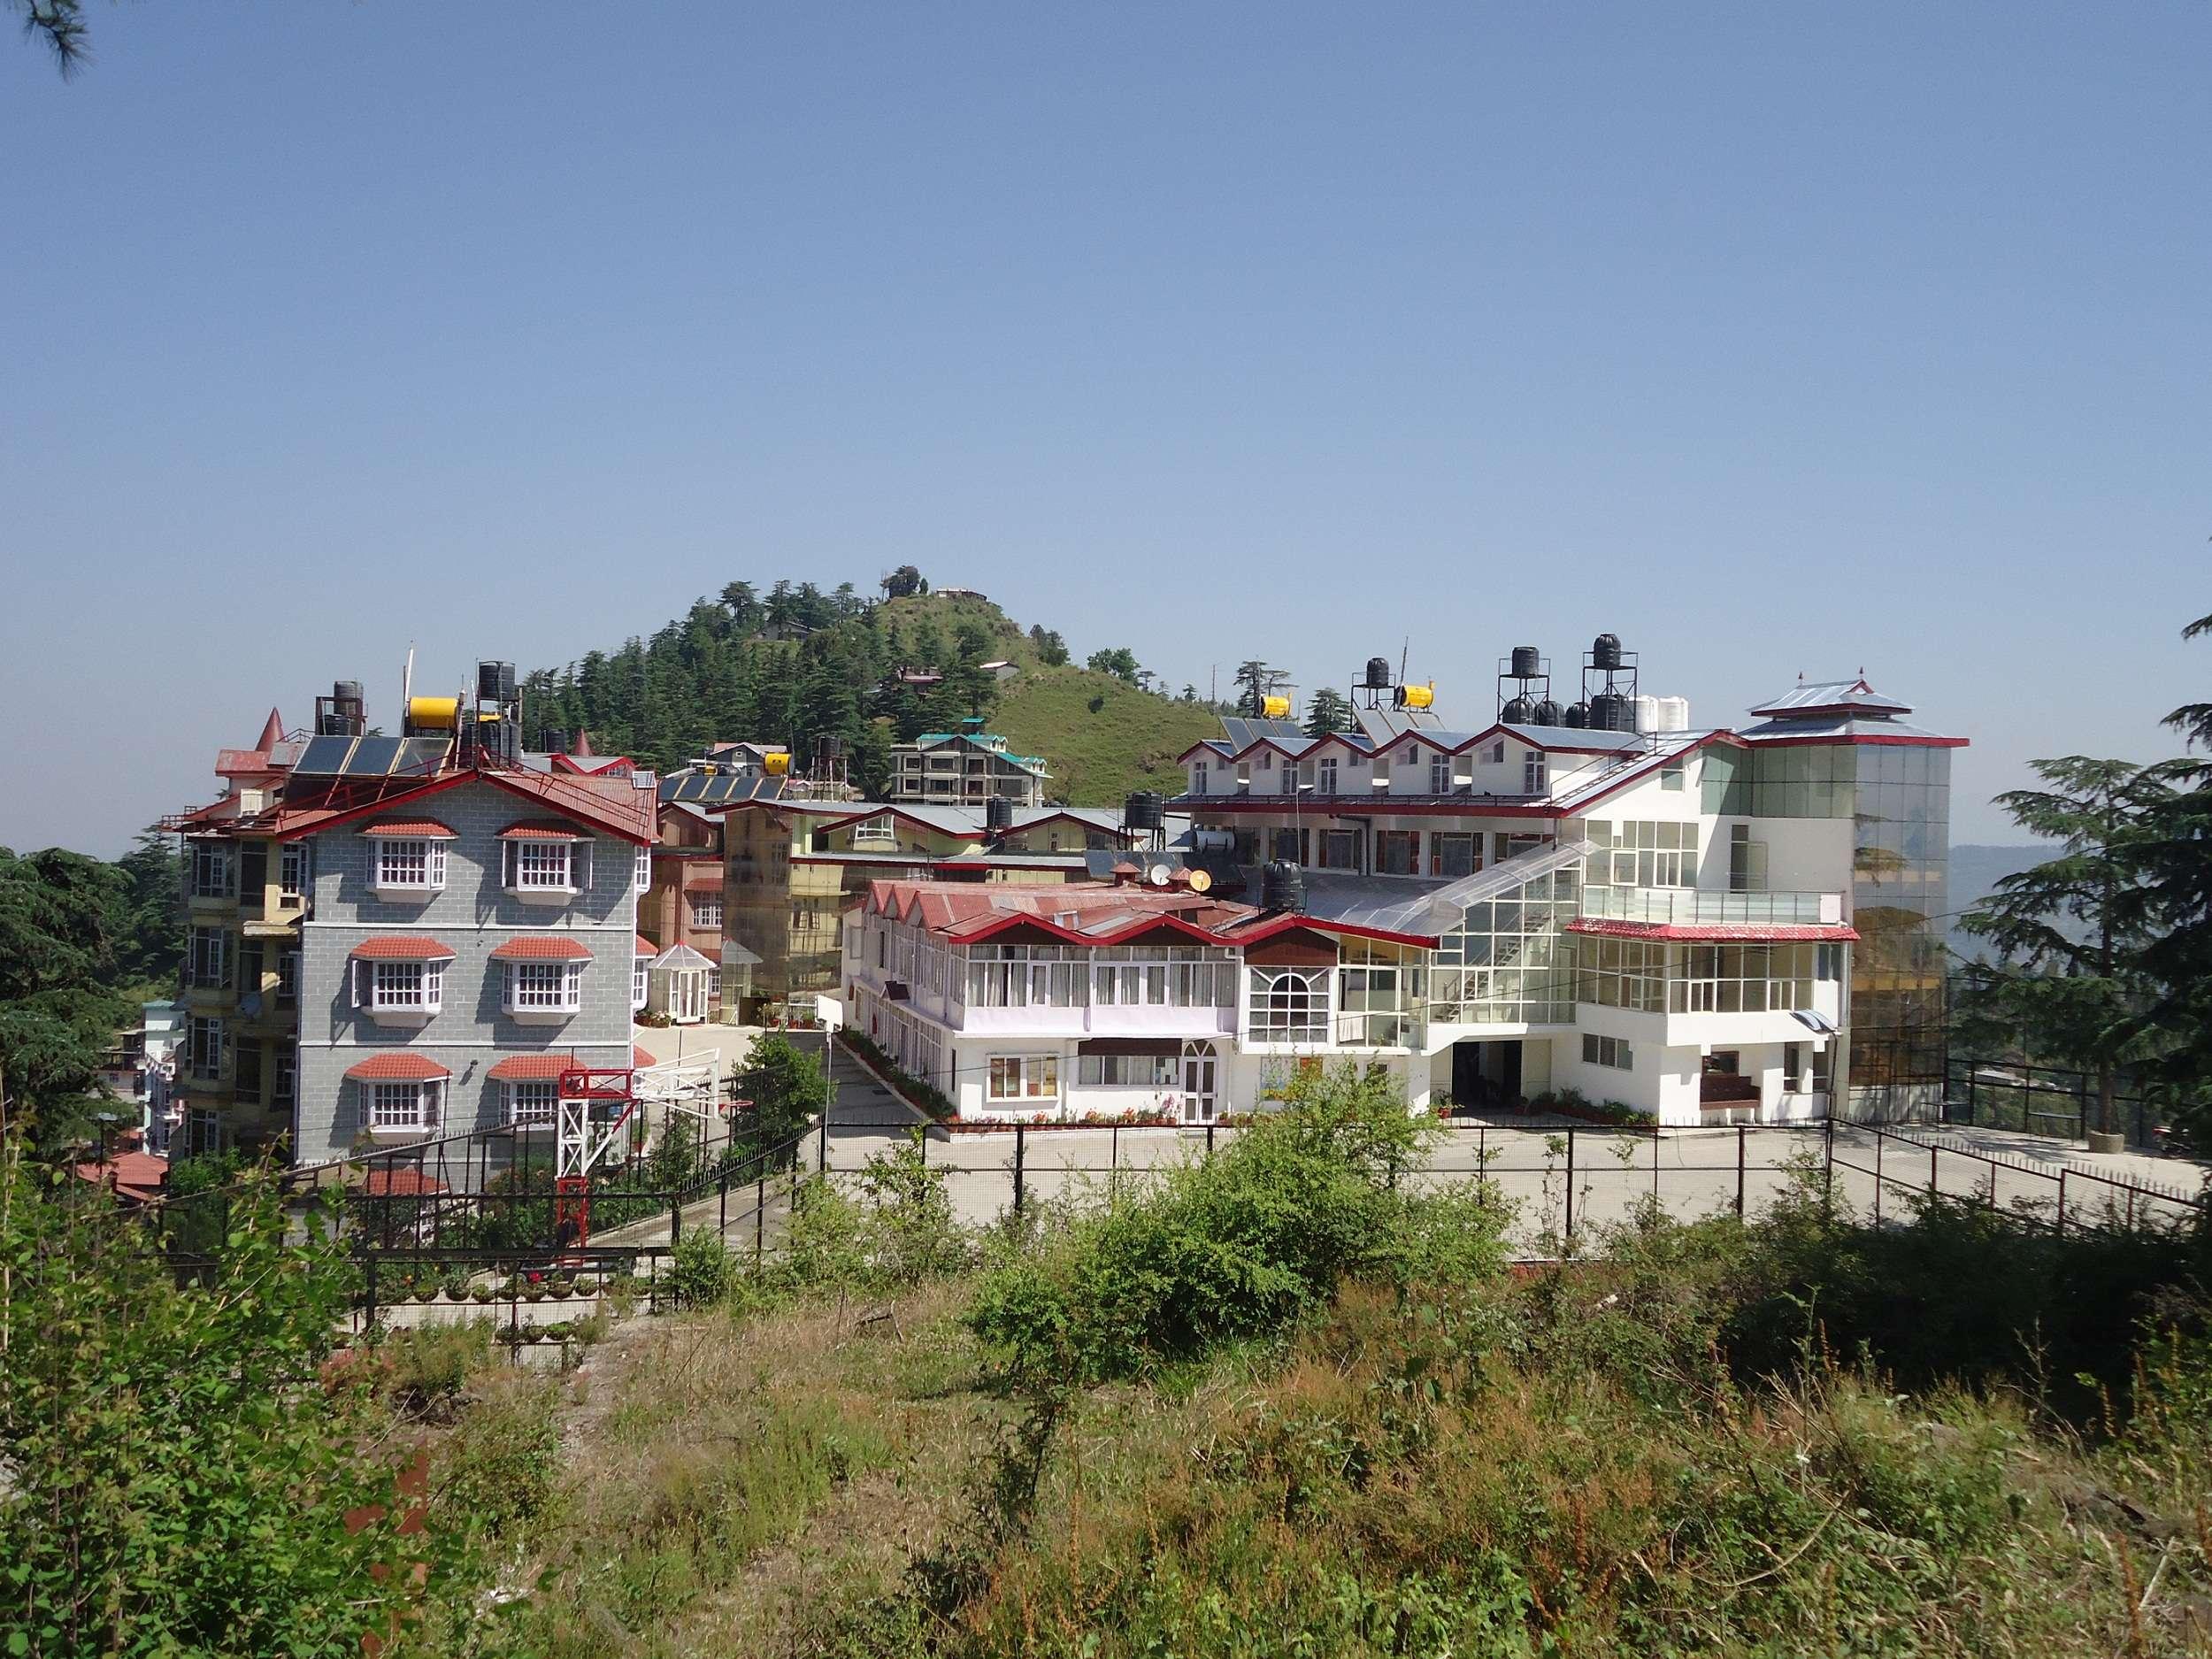 LAUREATE PUBLIC SCHOOL BRANCE PETH BHARARI SHIMLA HIMACHAL PRADESH 630045